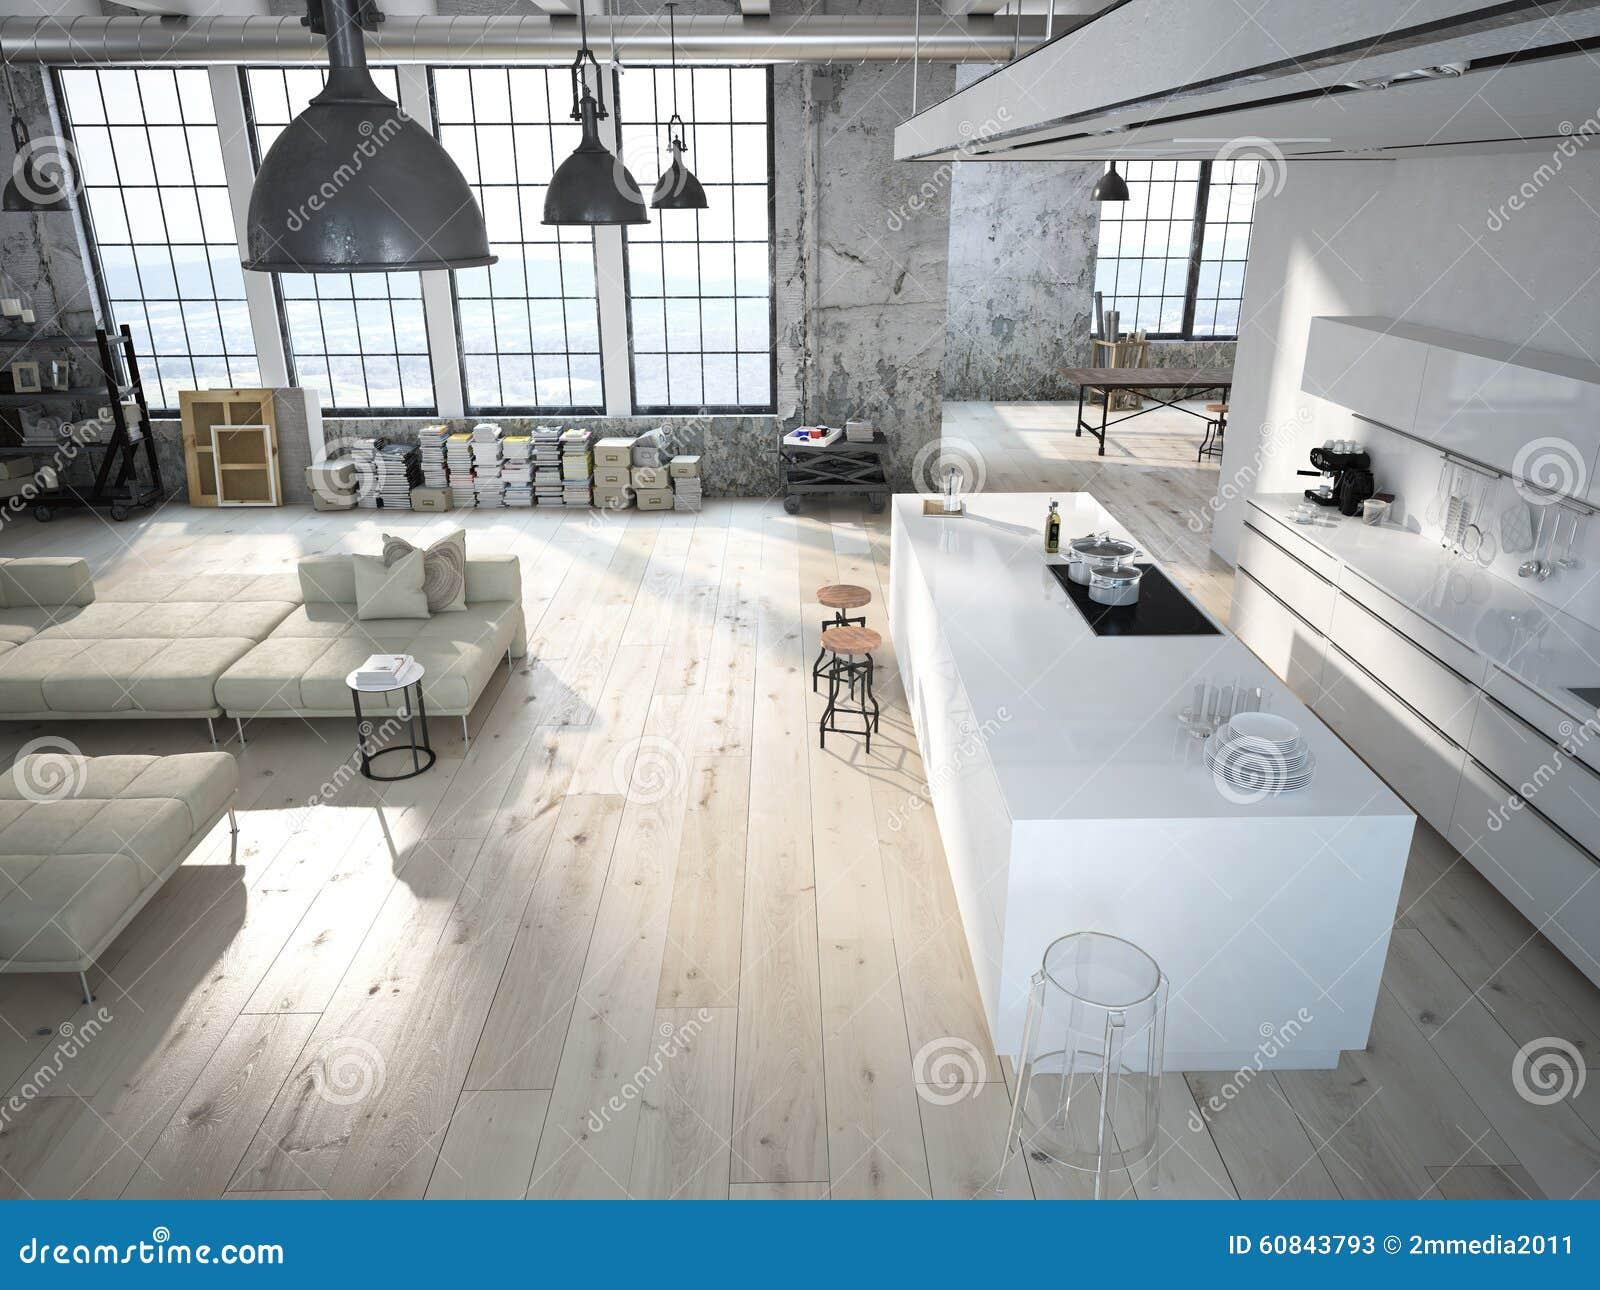 modern loft with a kitchen 3d rendering stock photo image 60843793. Black Bedroom Furniture Sets. Home Design Ideas